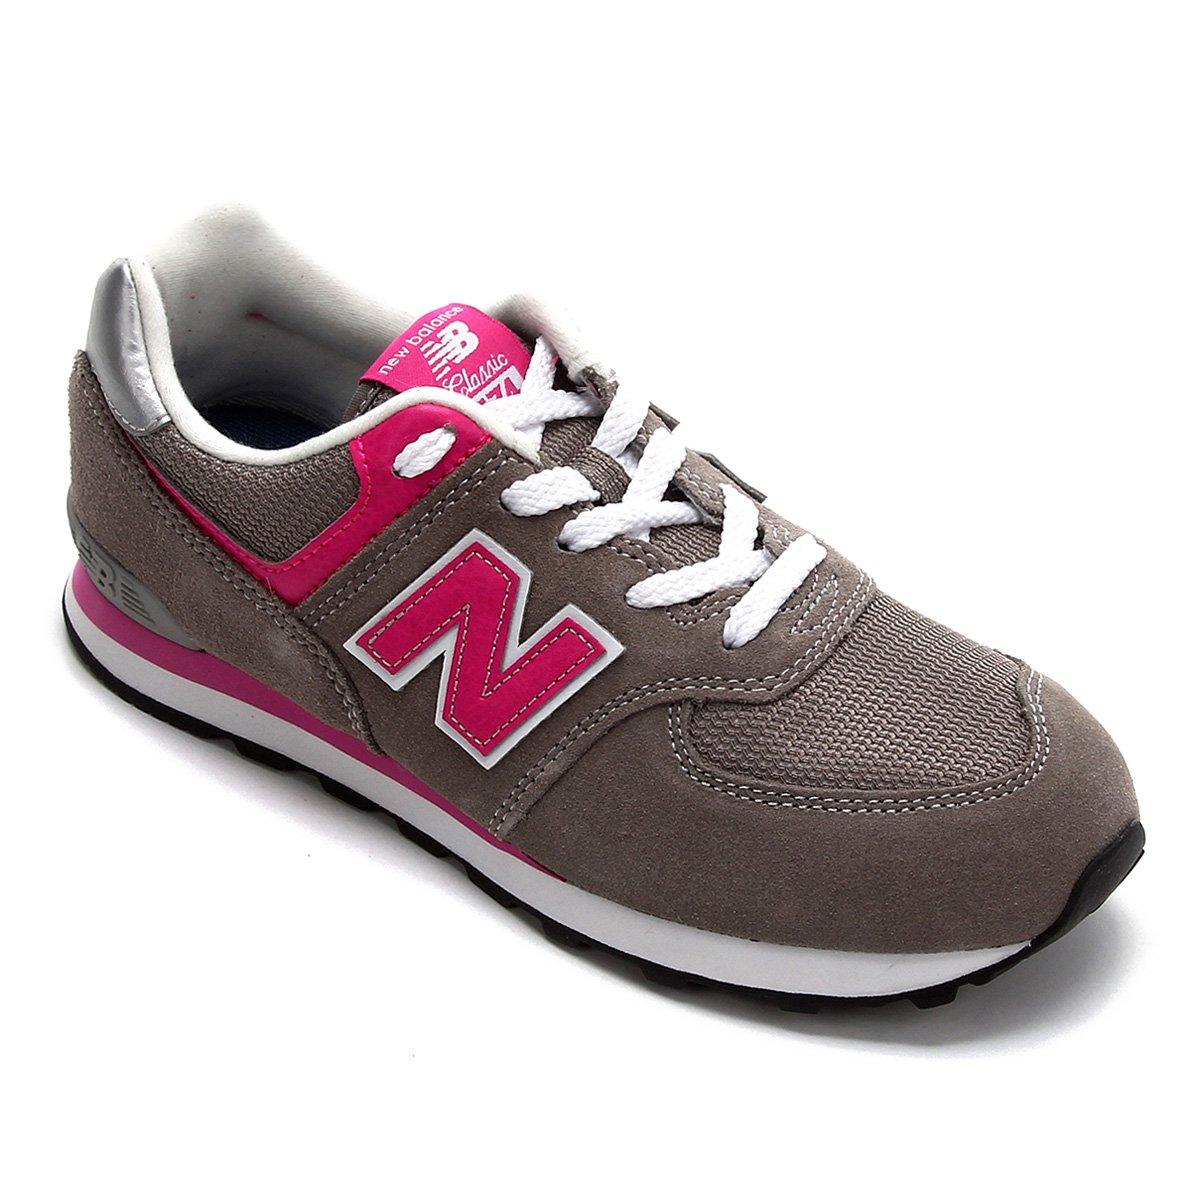 tenis new balance rosa e cinza